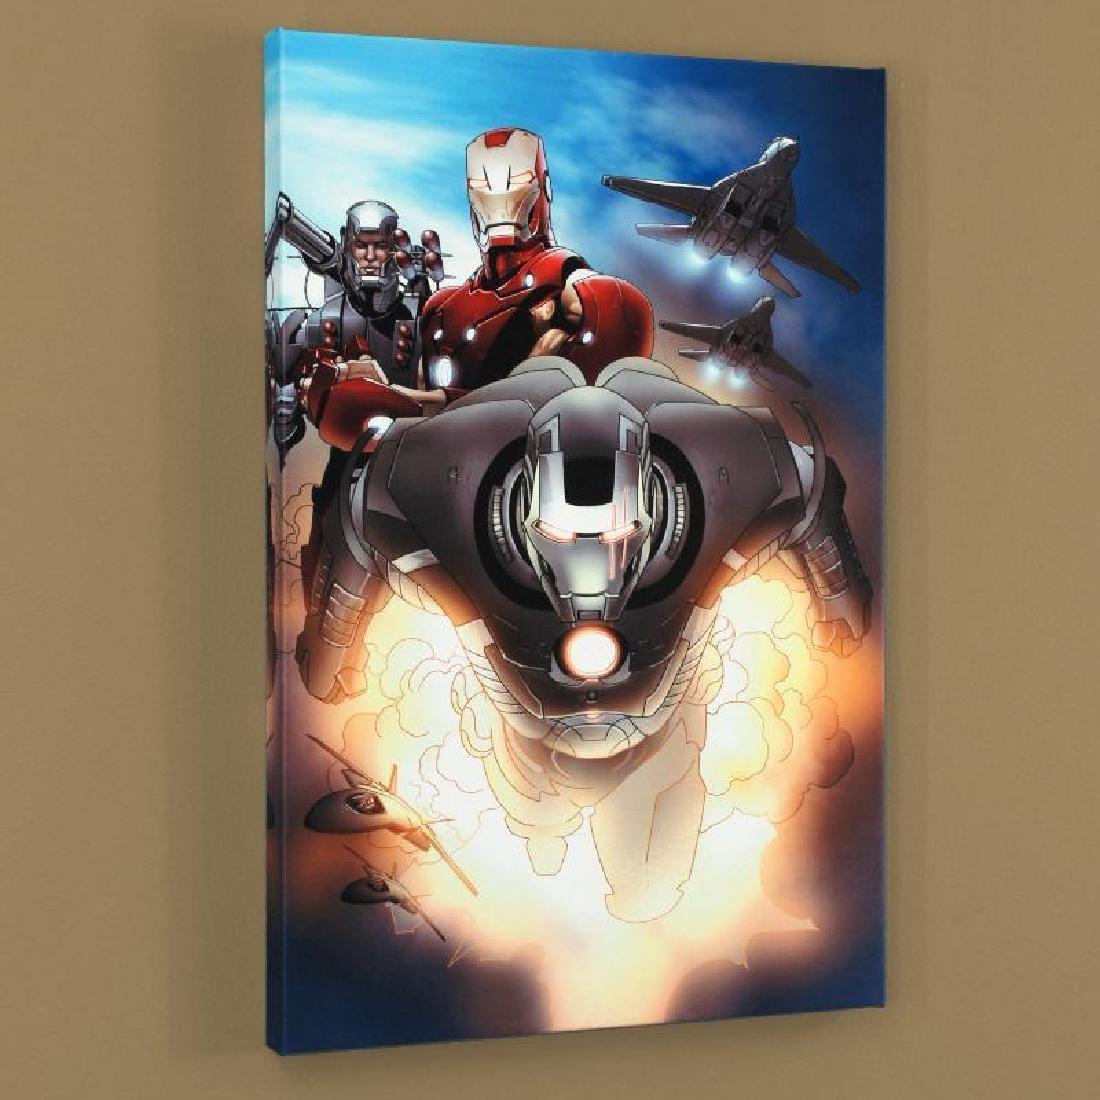 Iron Man 2.0 #7 by Marvel Comics - 3